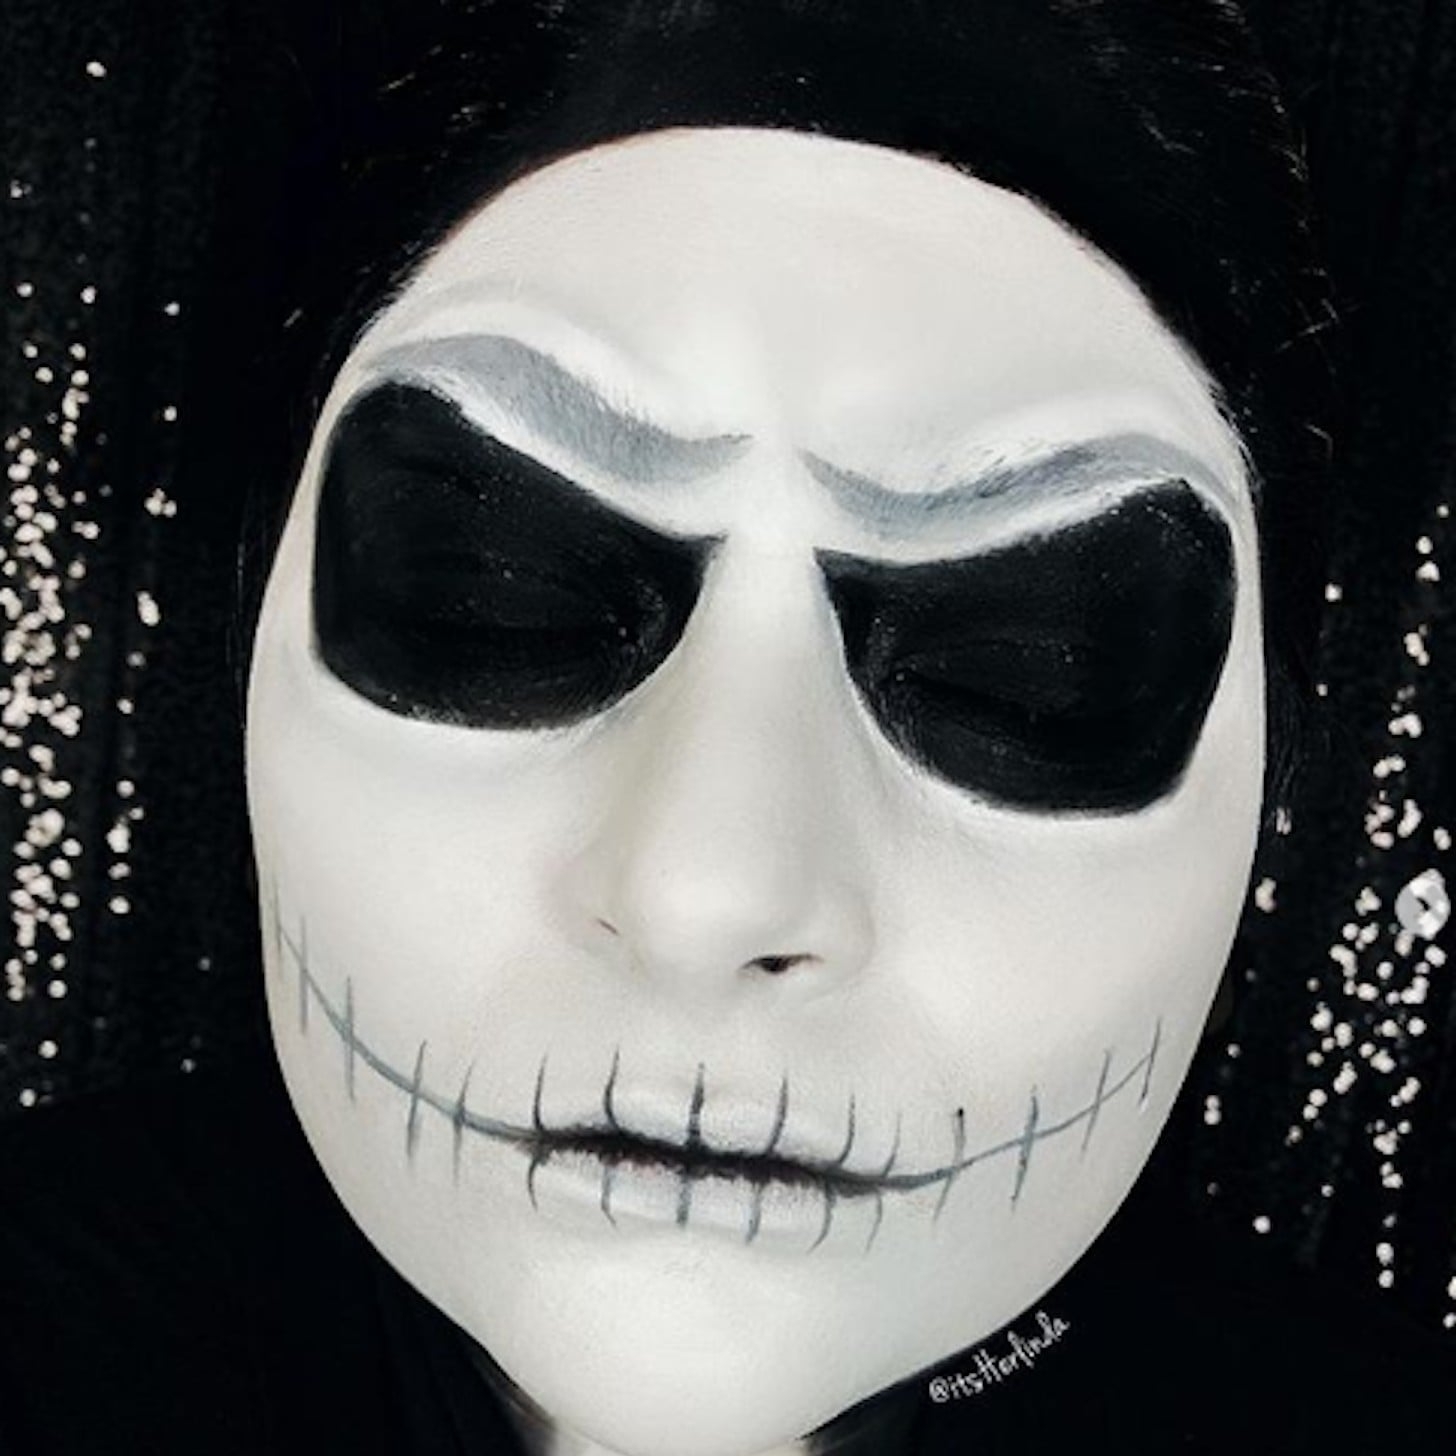 Nightmare Before Christmas Makeup Looks | POPSUGAR Beauty